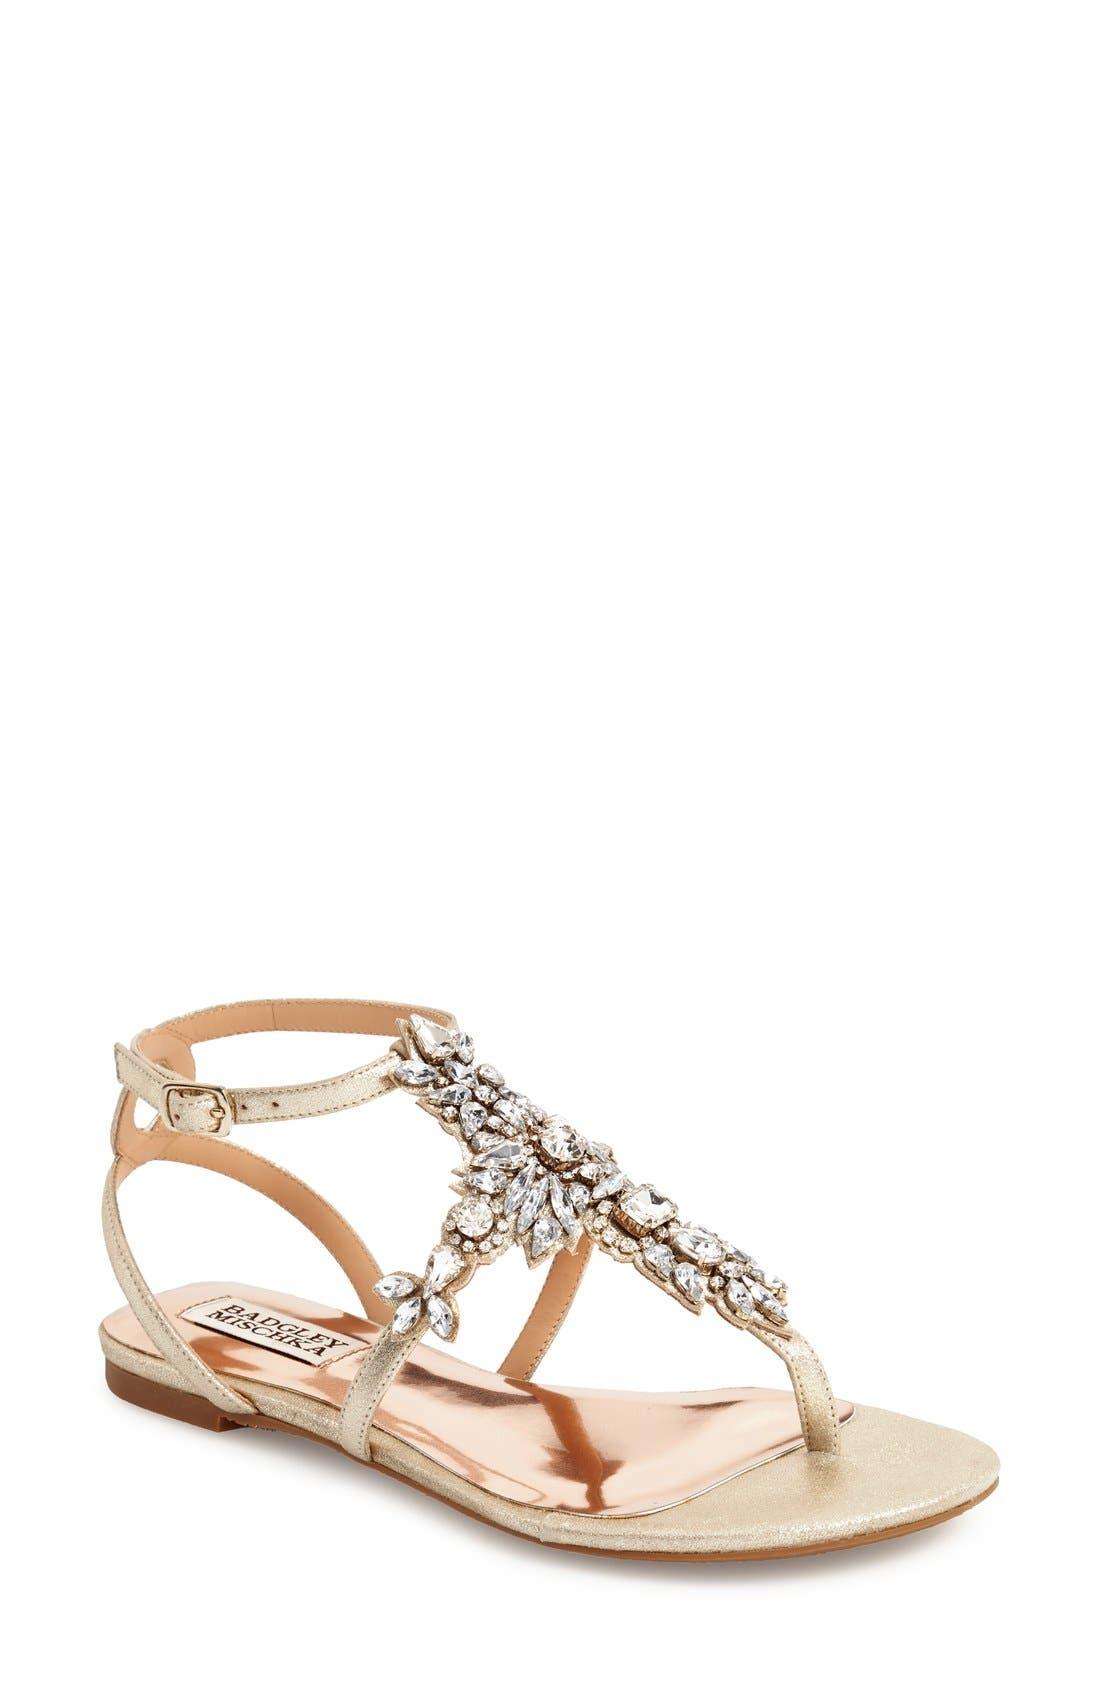 Main Image - Badgley Mischka 'Cara' Crystal Embellished Flat Sandal (Women)